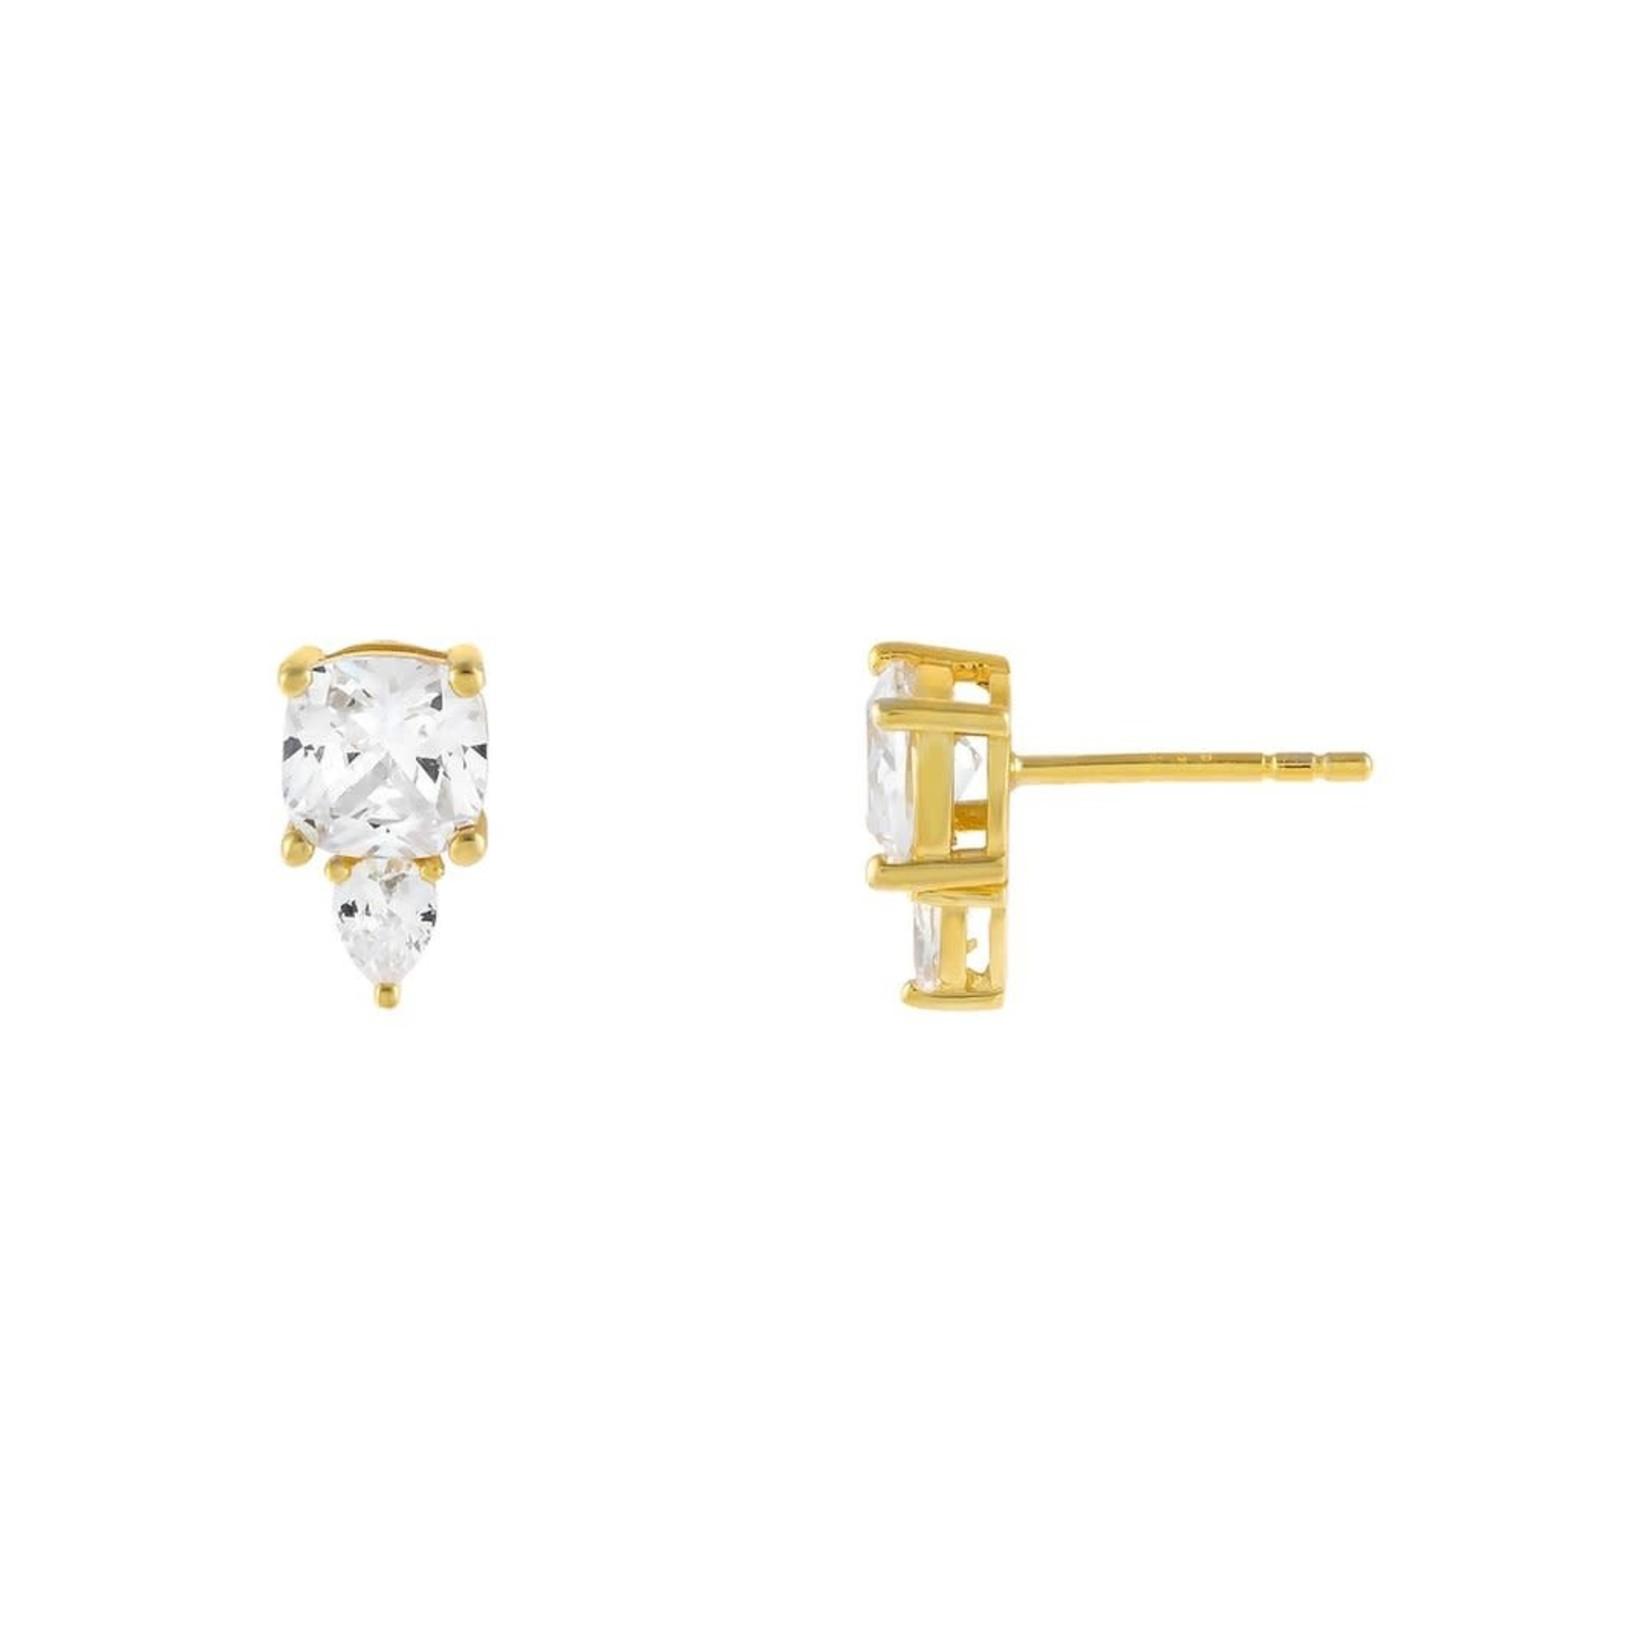 Adinas CZ Double Stone Stud Earrings